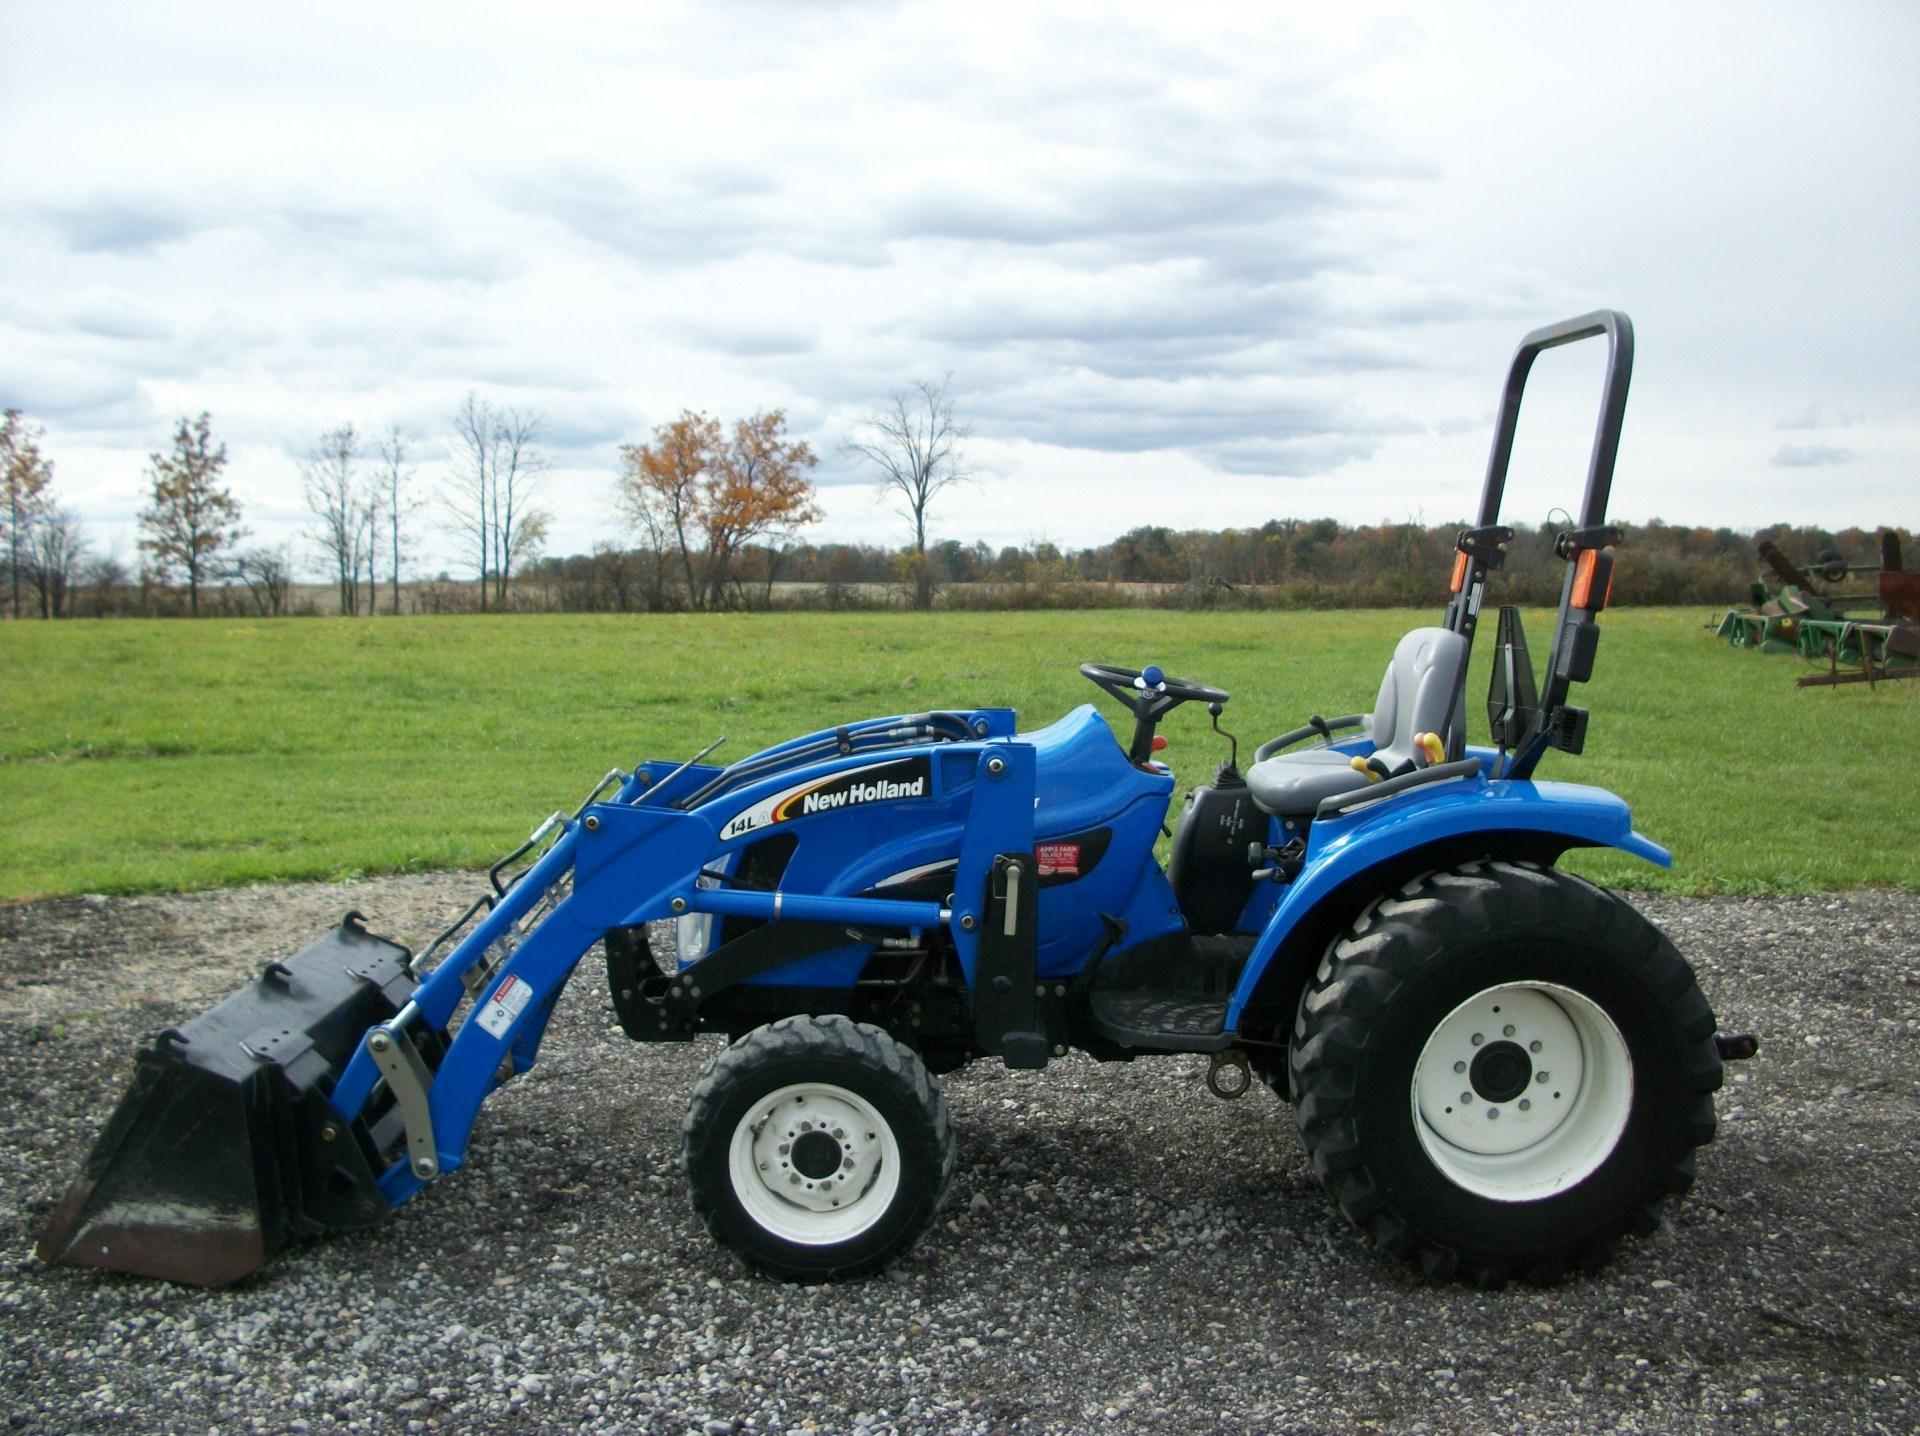 2004 New Holland TC33DA    $13,900